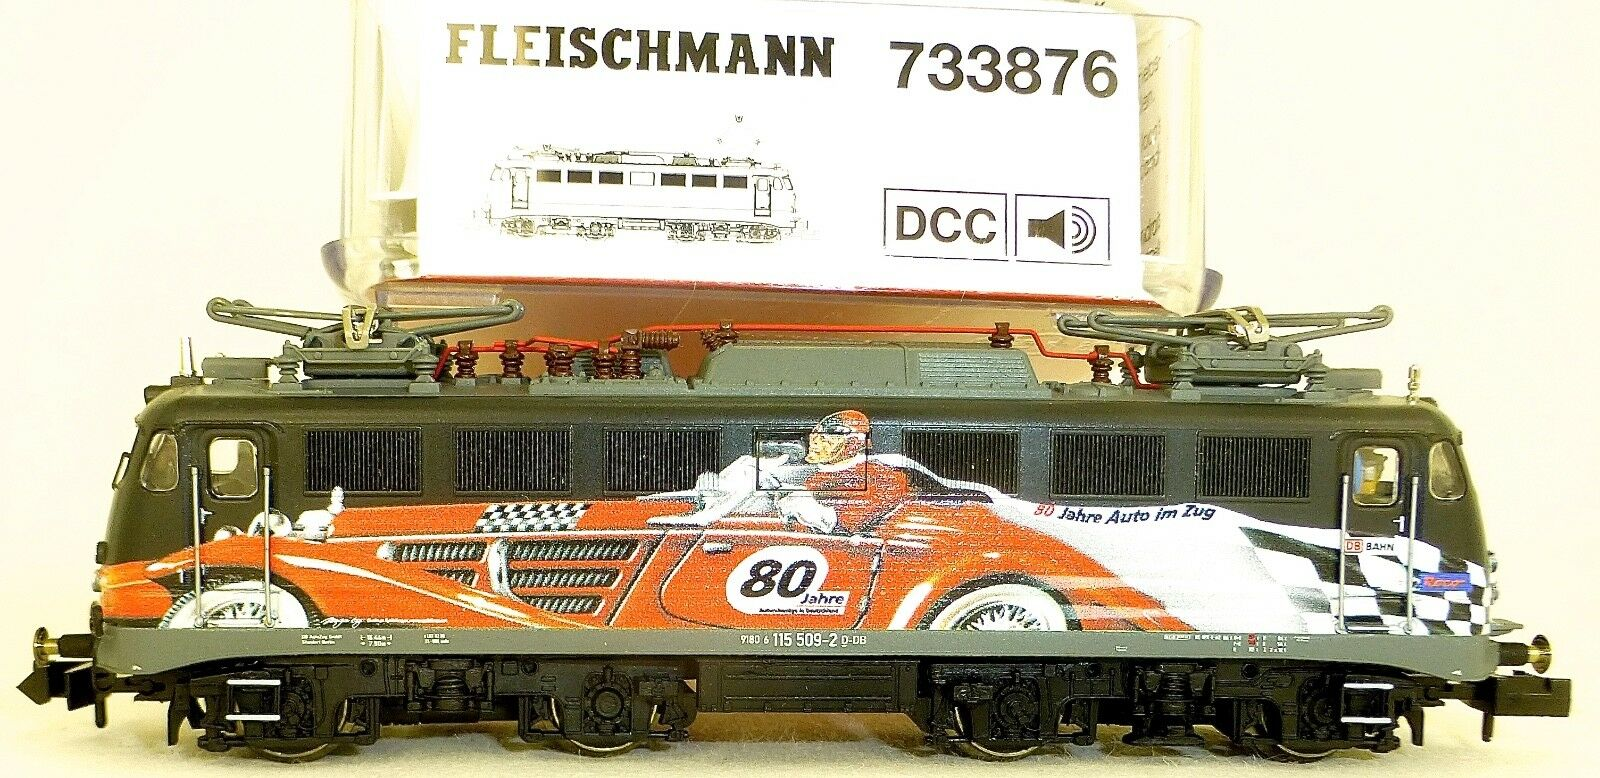 E 115 Ellok 80 Jahre Autozug DIGITAL SOUND Fleischmann 733876 N 1 160 OVP å